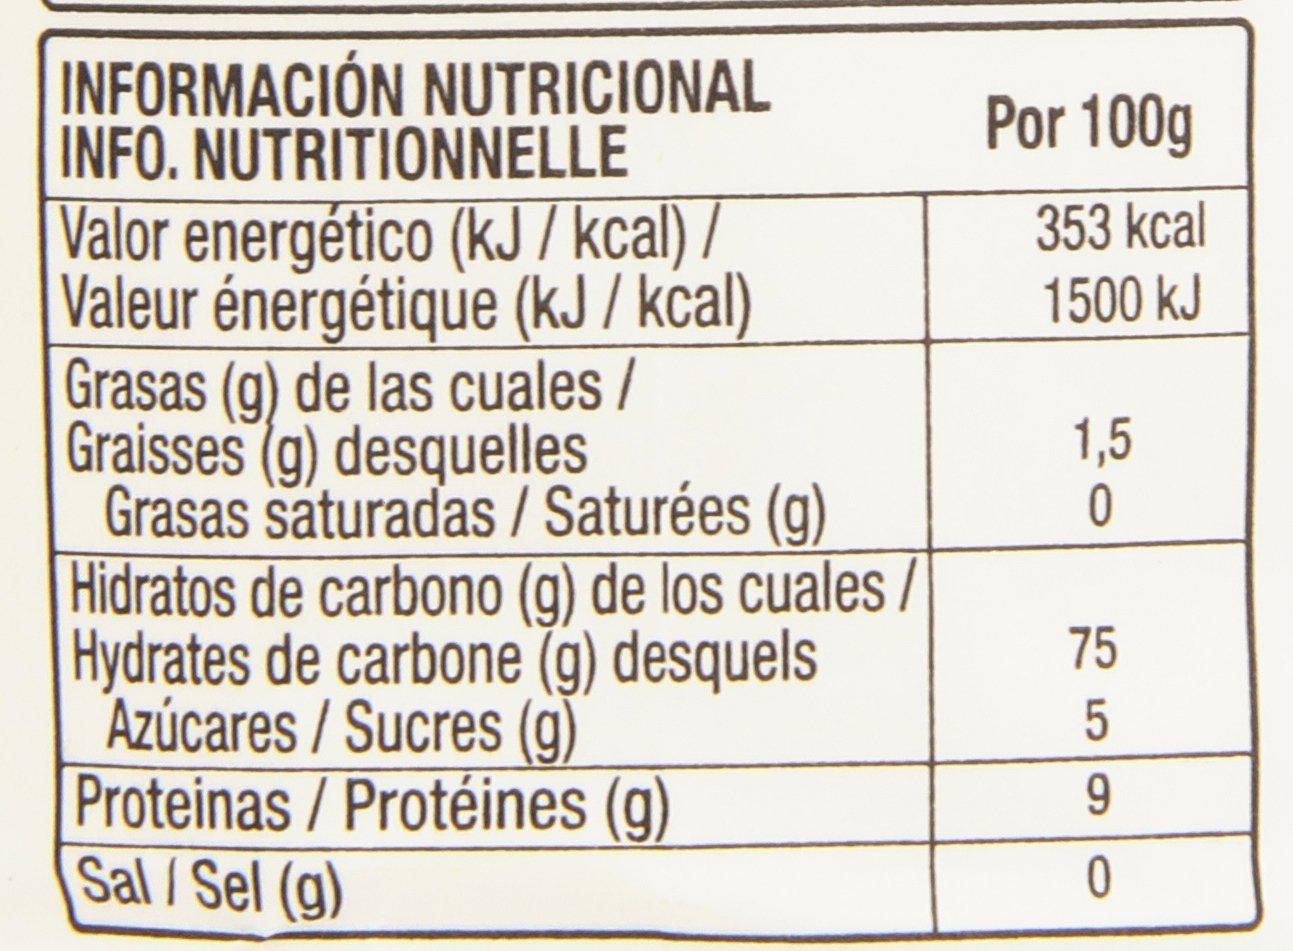 Gourmet Harina de Trigo - 500 g: Amazon.es: Amazon Pantry